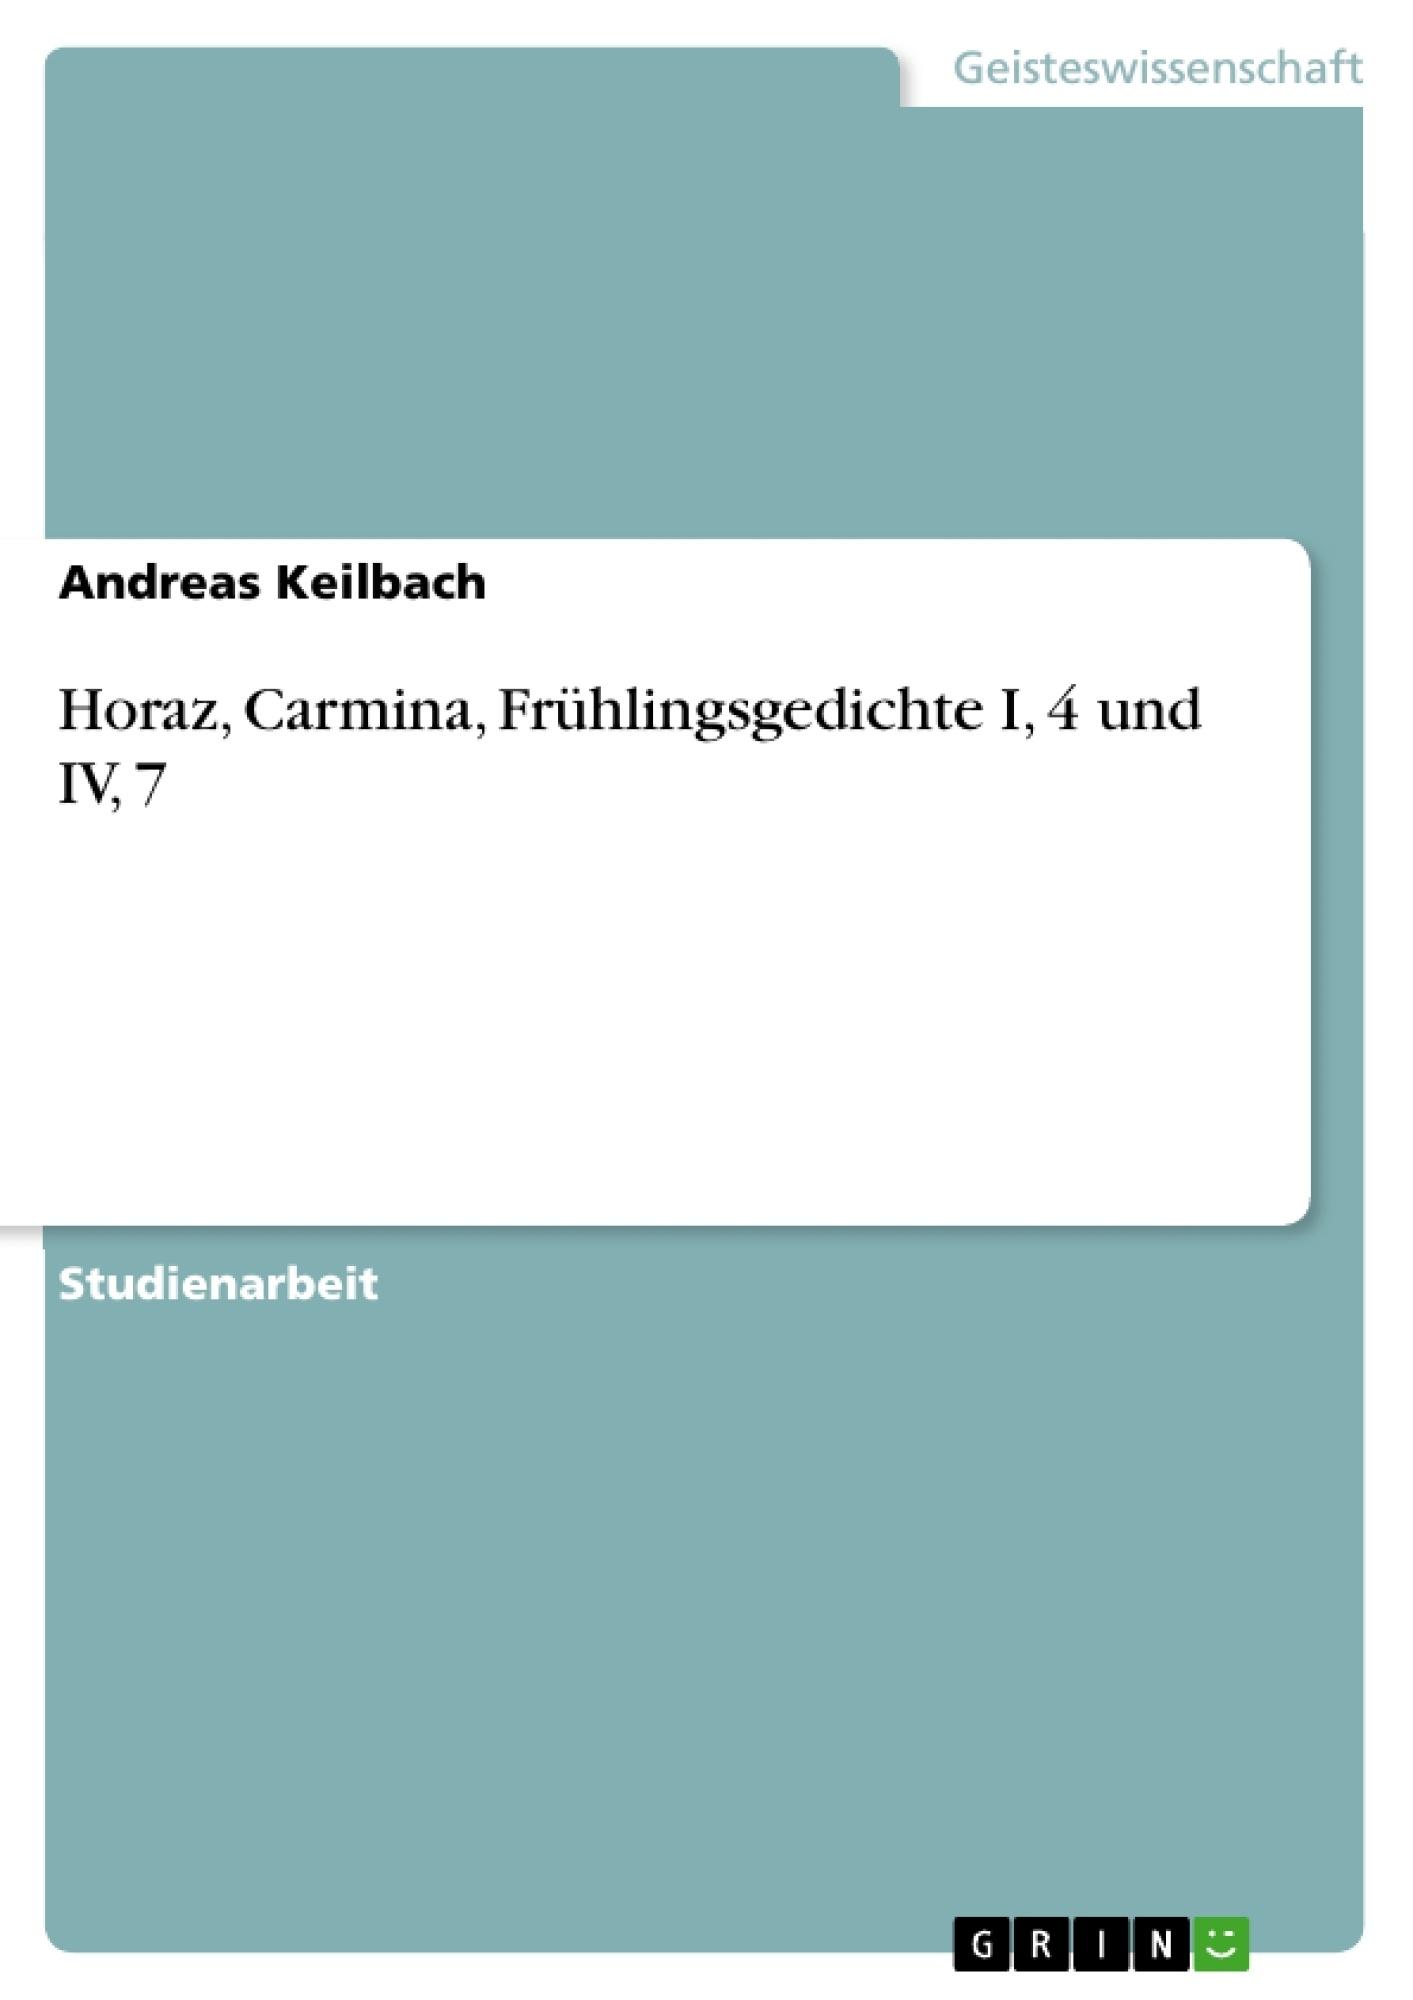 Titel: Horaz, Carmina, Frühlingsgedichte I, 4 und IV, 7